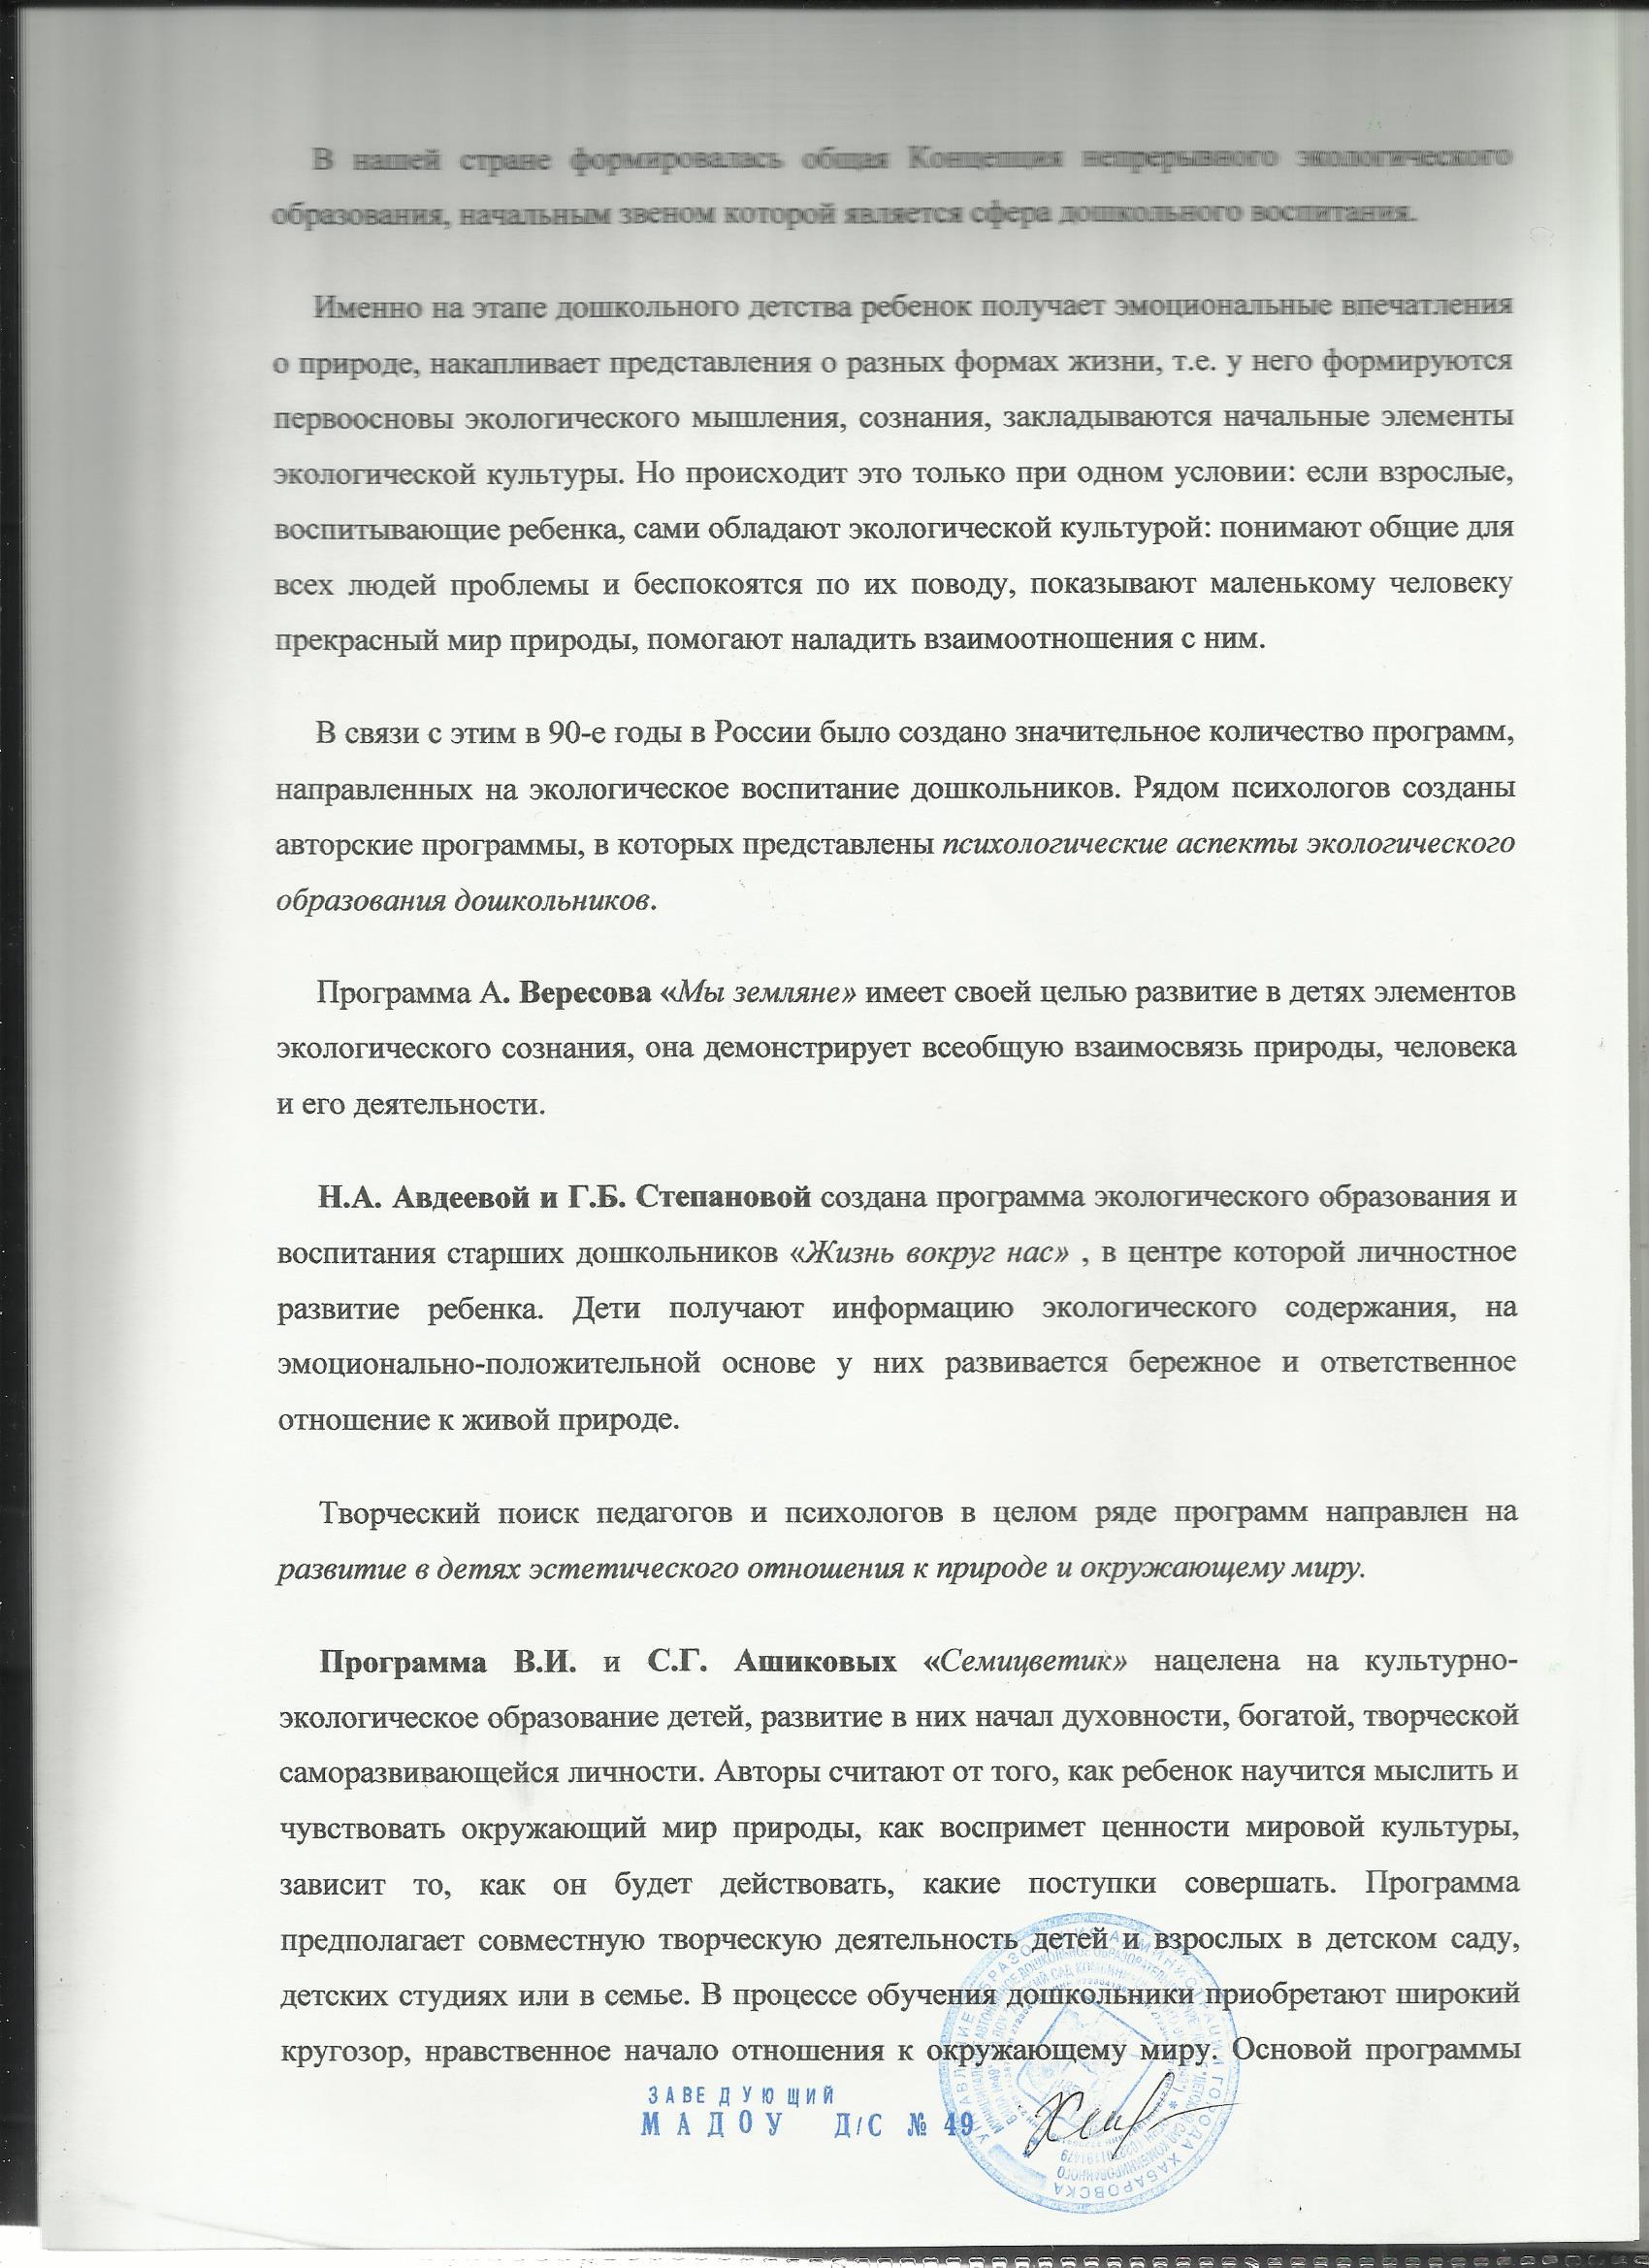 C:\Users\Я\Desktop\001.jpg